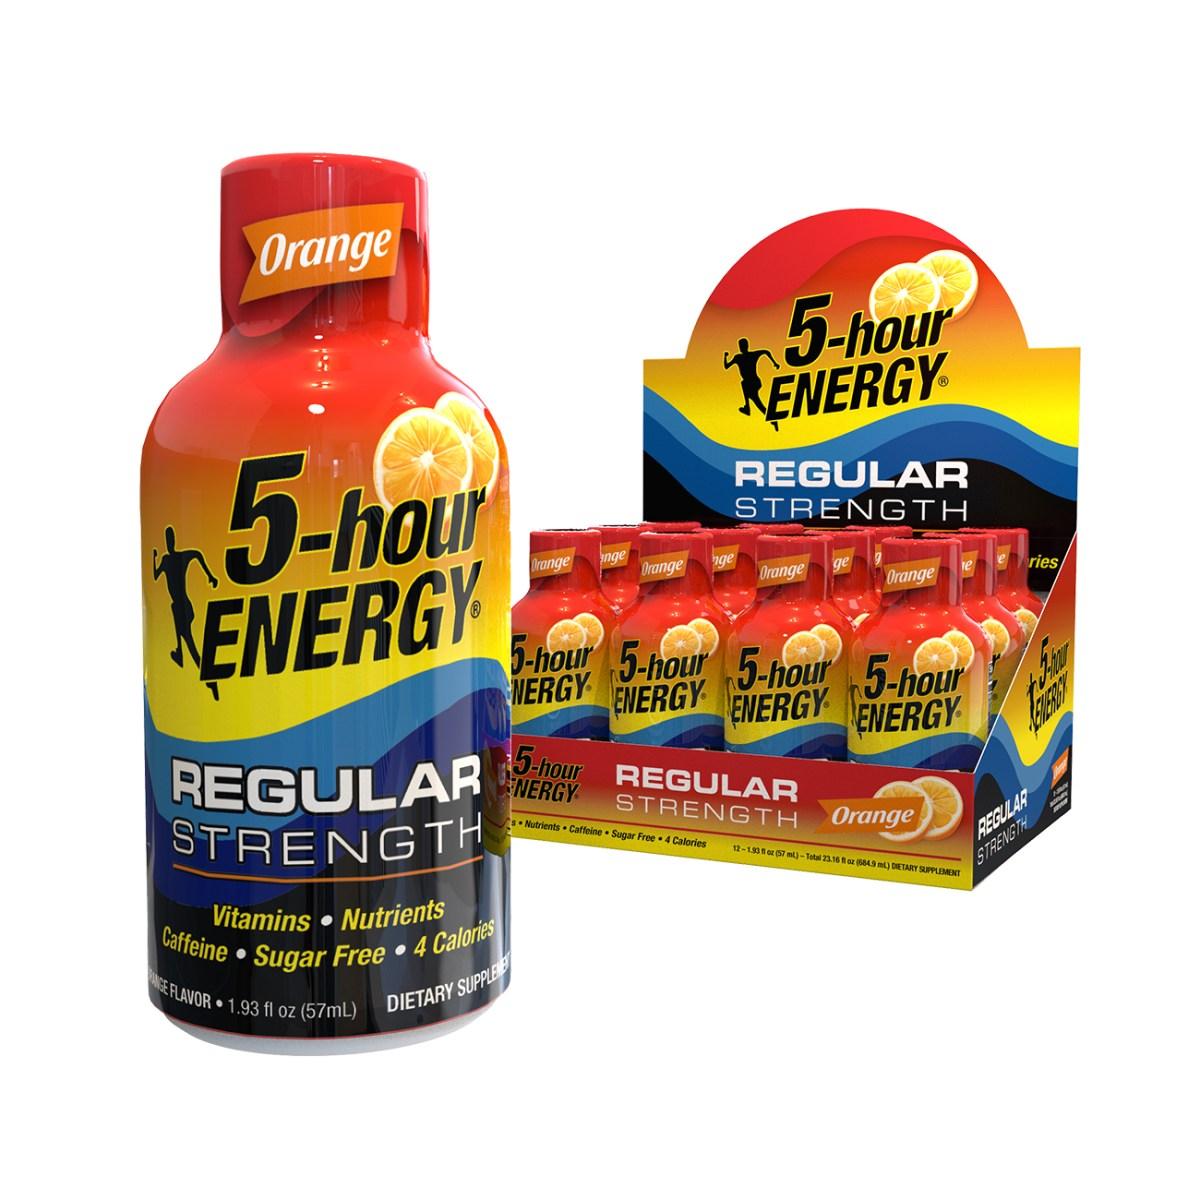 Orange flavor Regular Strength 5-hour ENERGY® Shots